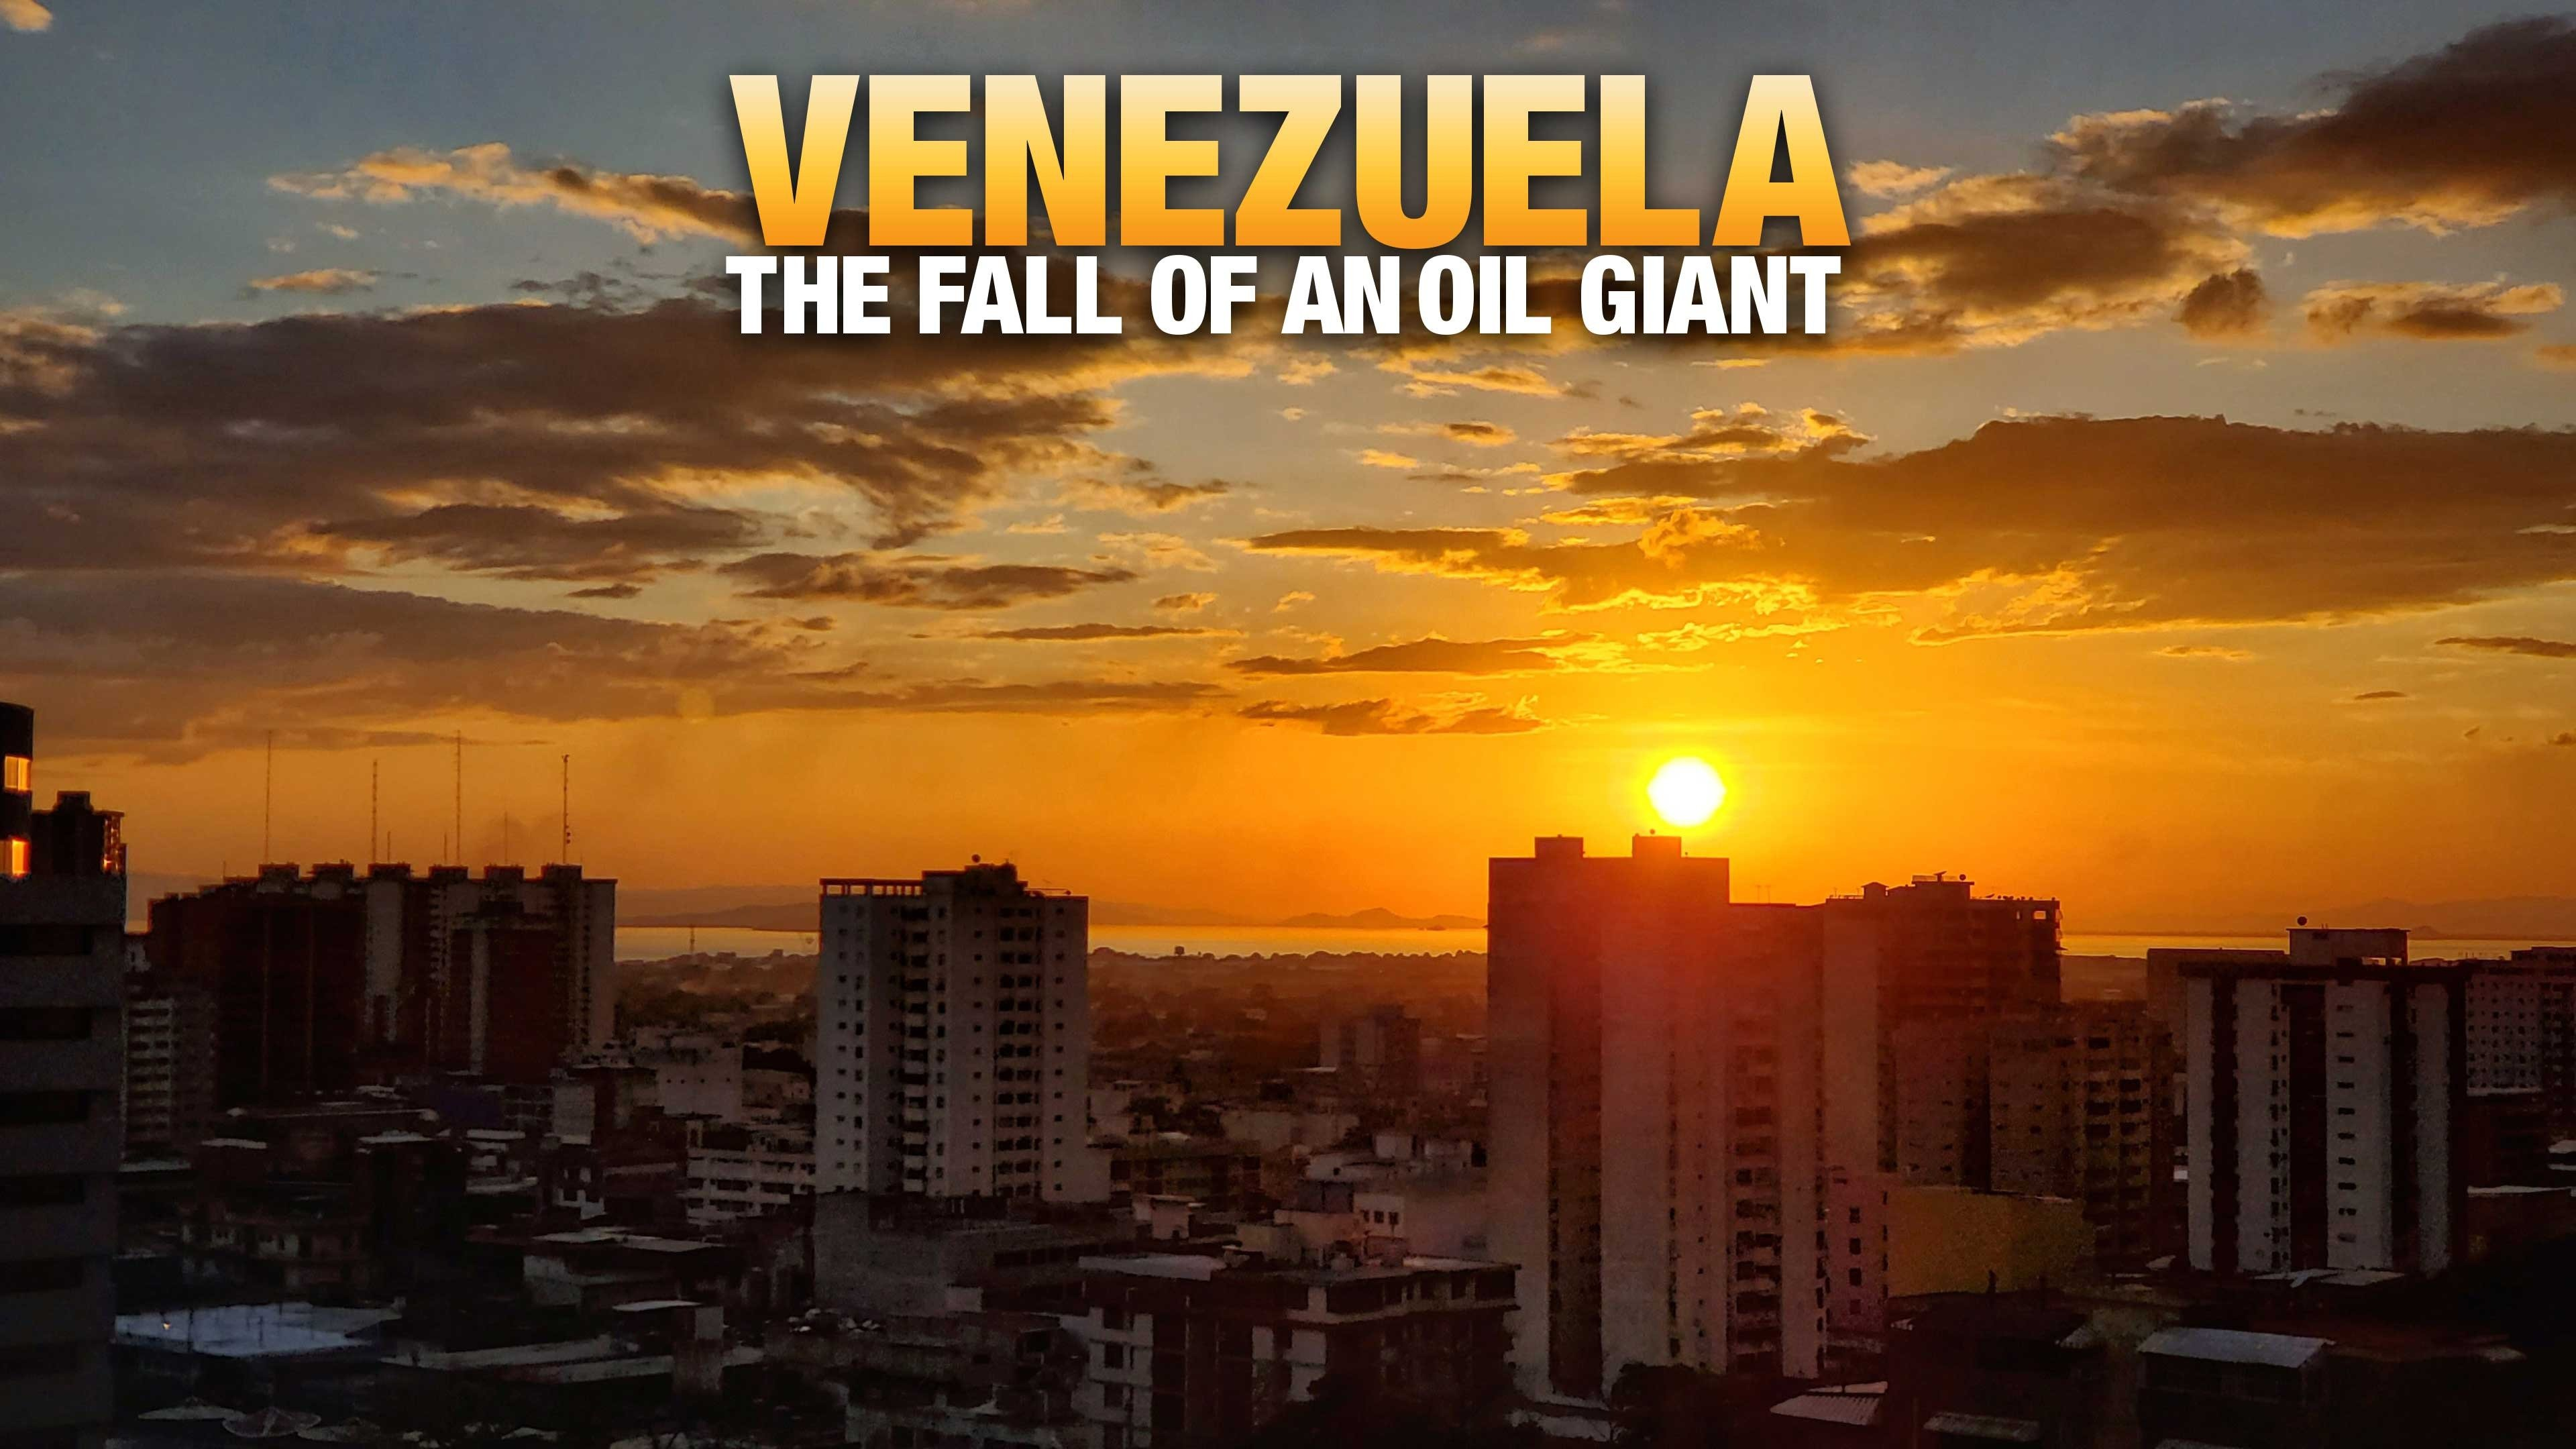 Venezuela: The Fall of an Oil Giant